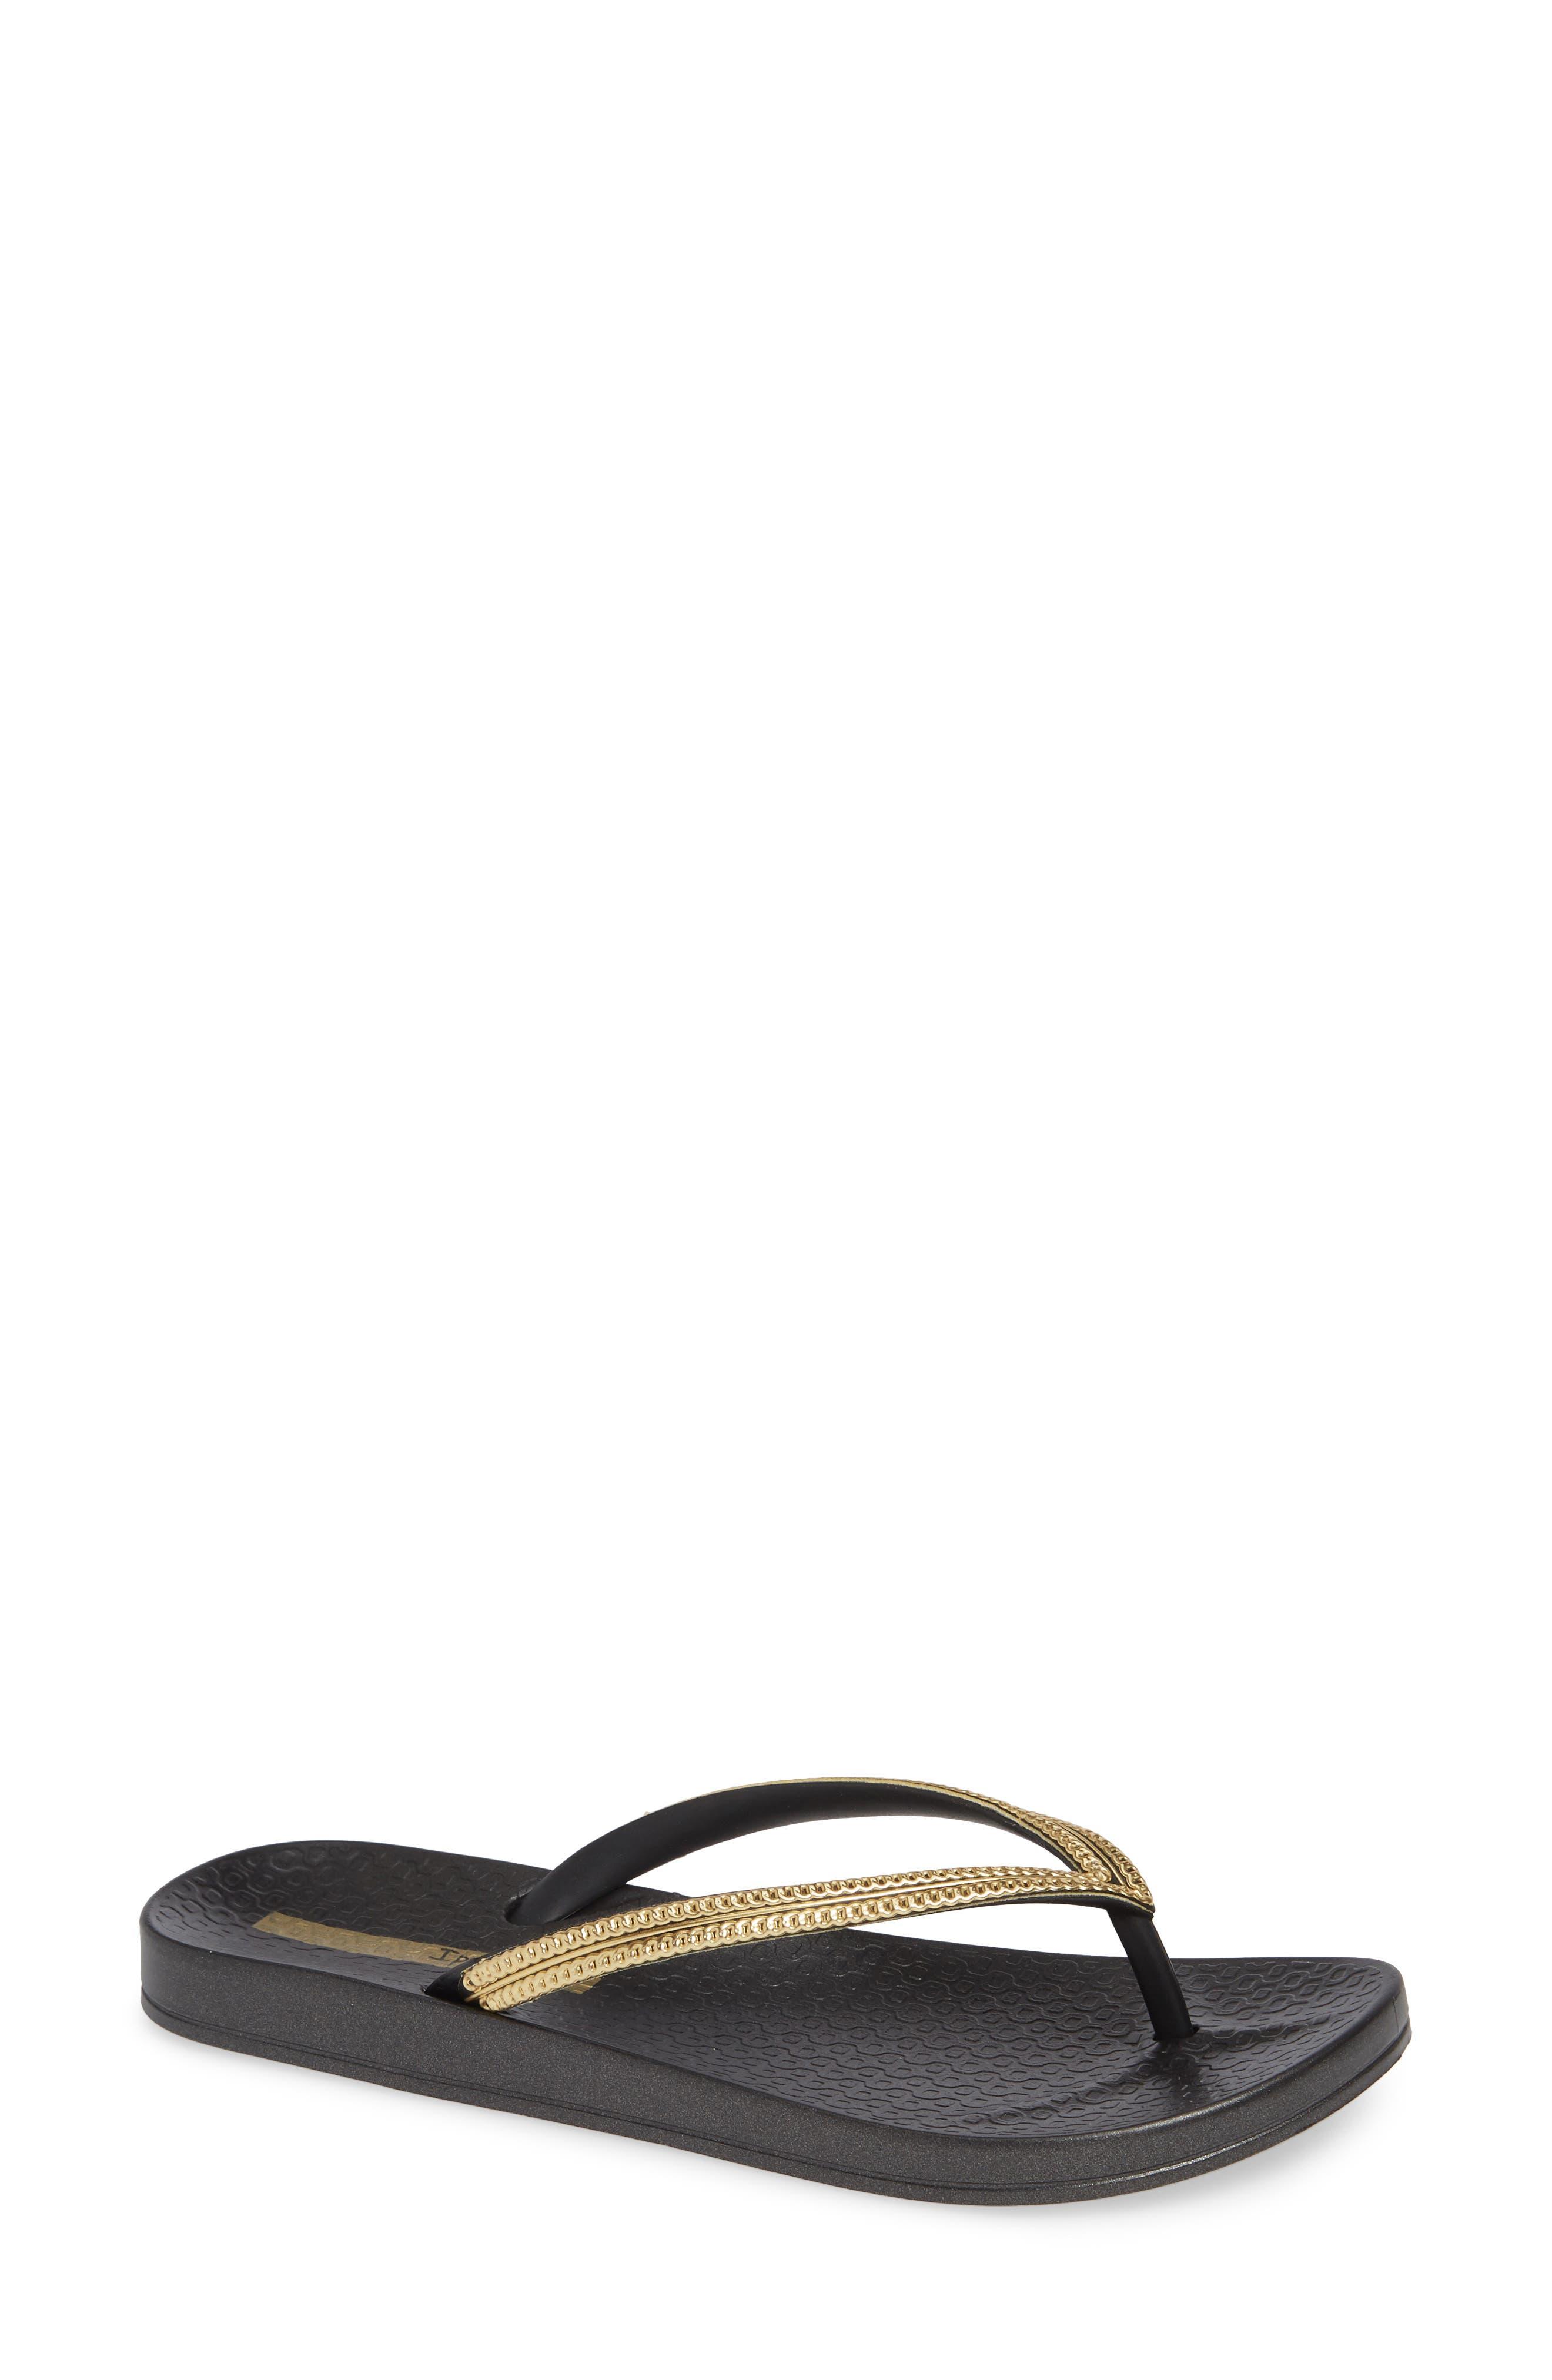 IPANEMA Ana Metallic Flip Flop, Main, color, BLACK/ GOLD